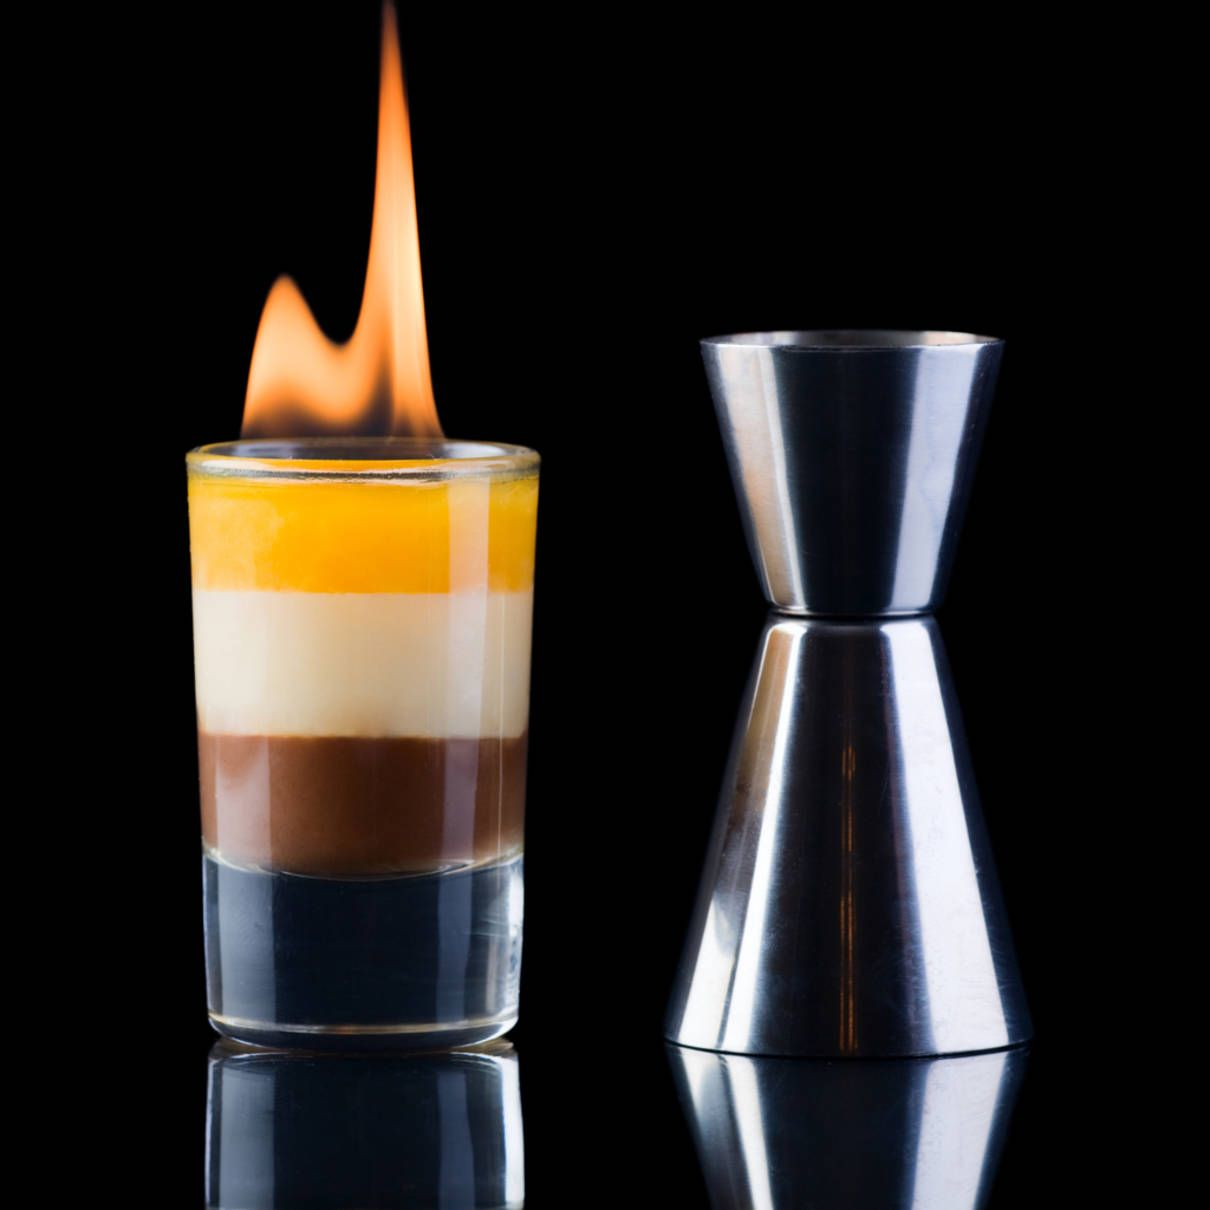 B-52 Drink 1/3 Shot Kahlua® Coffee Liqueur 1/3 Shot